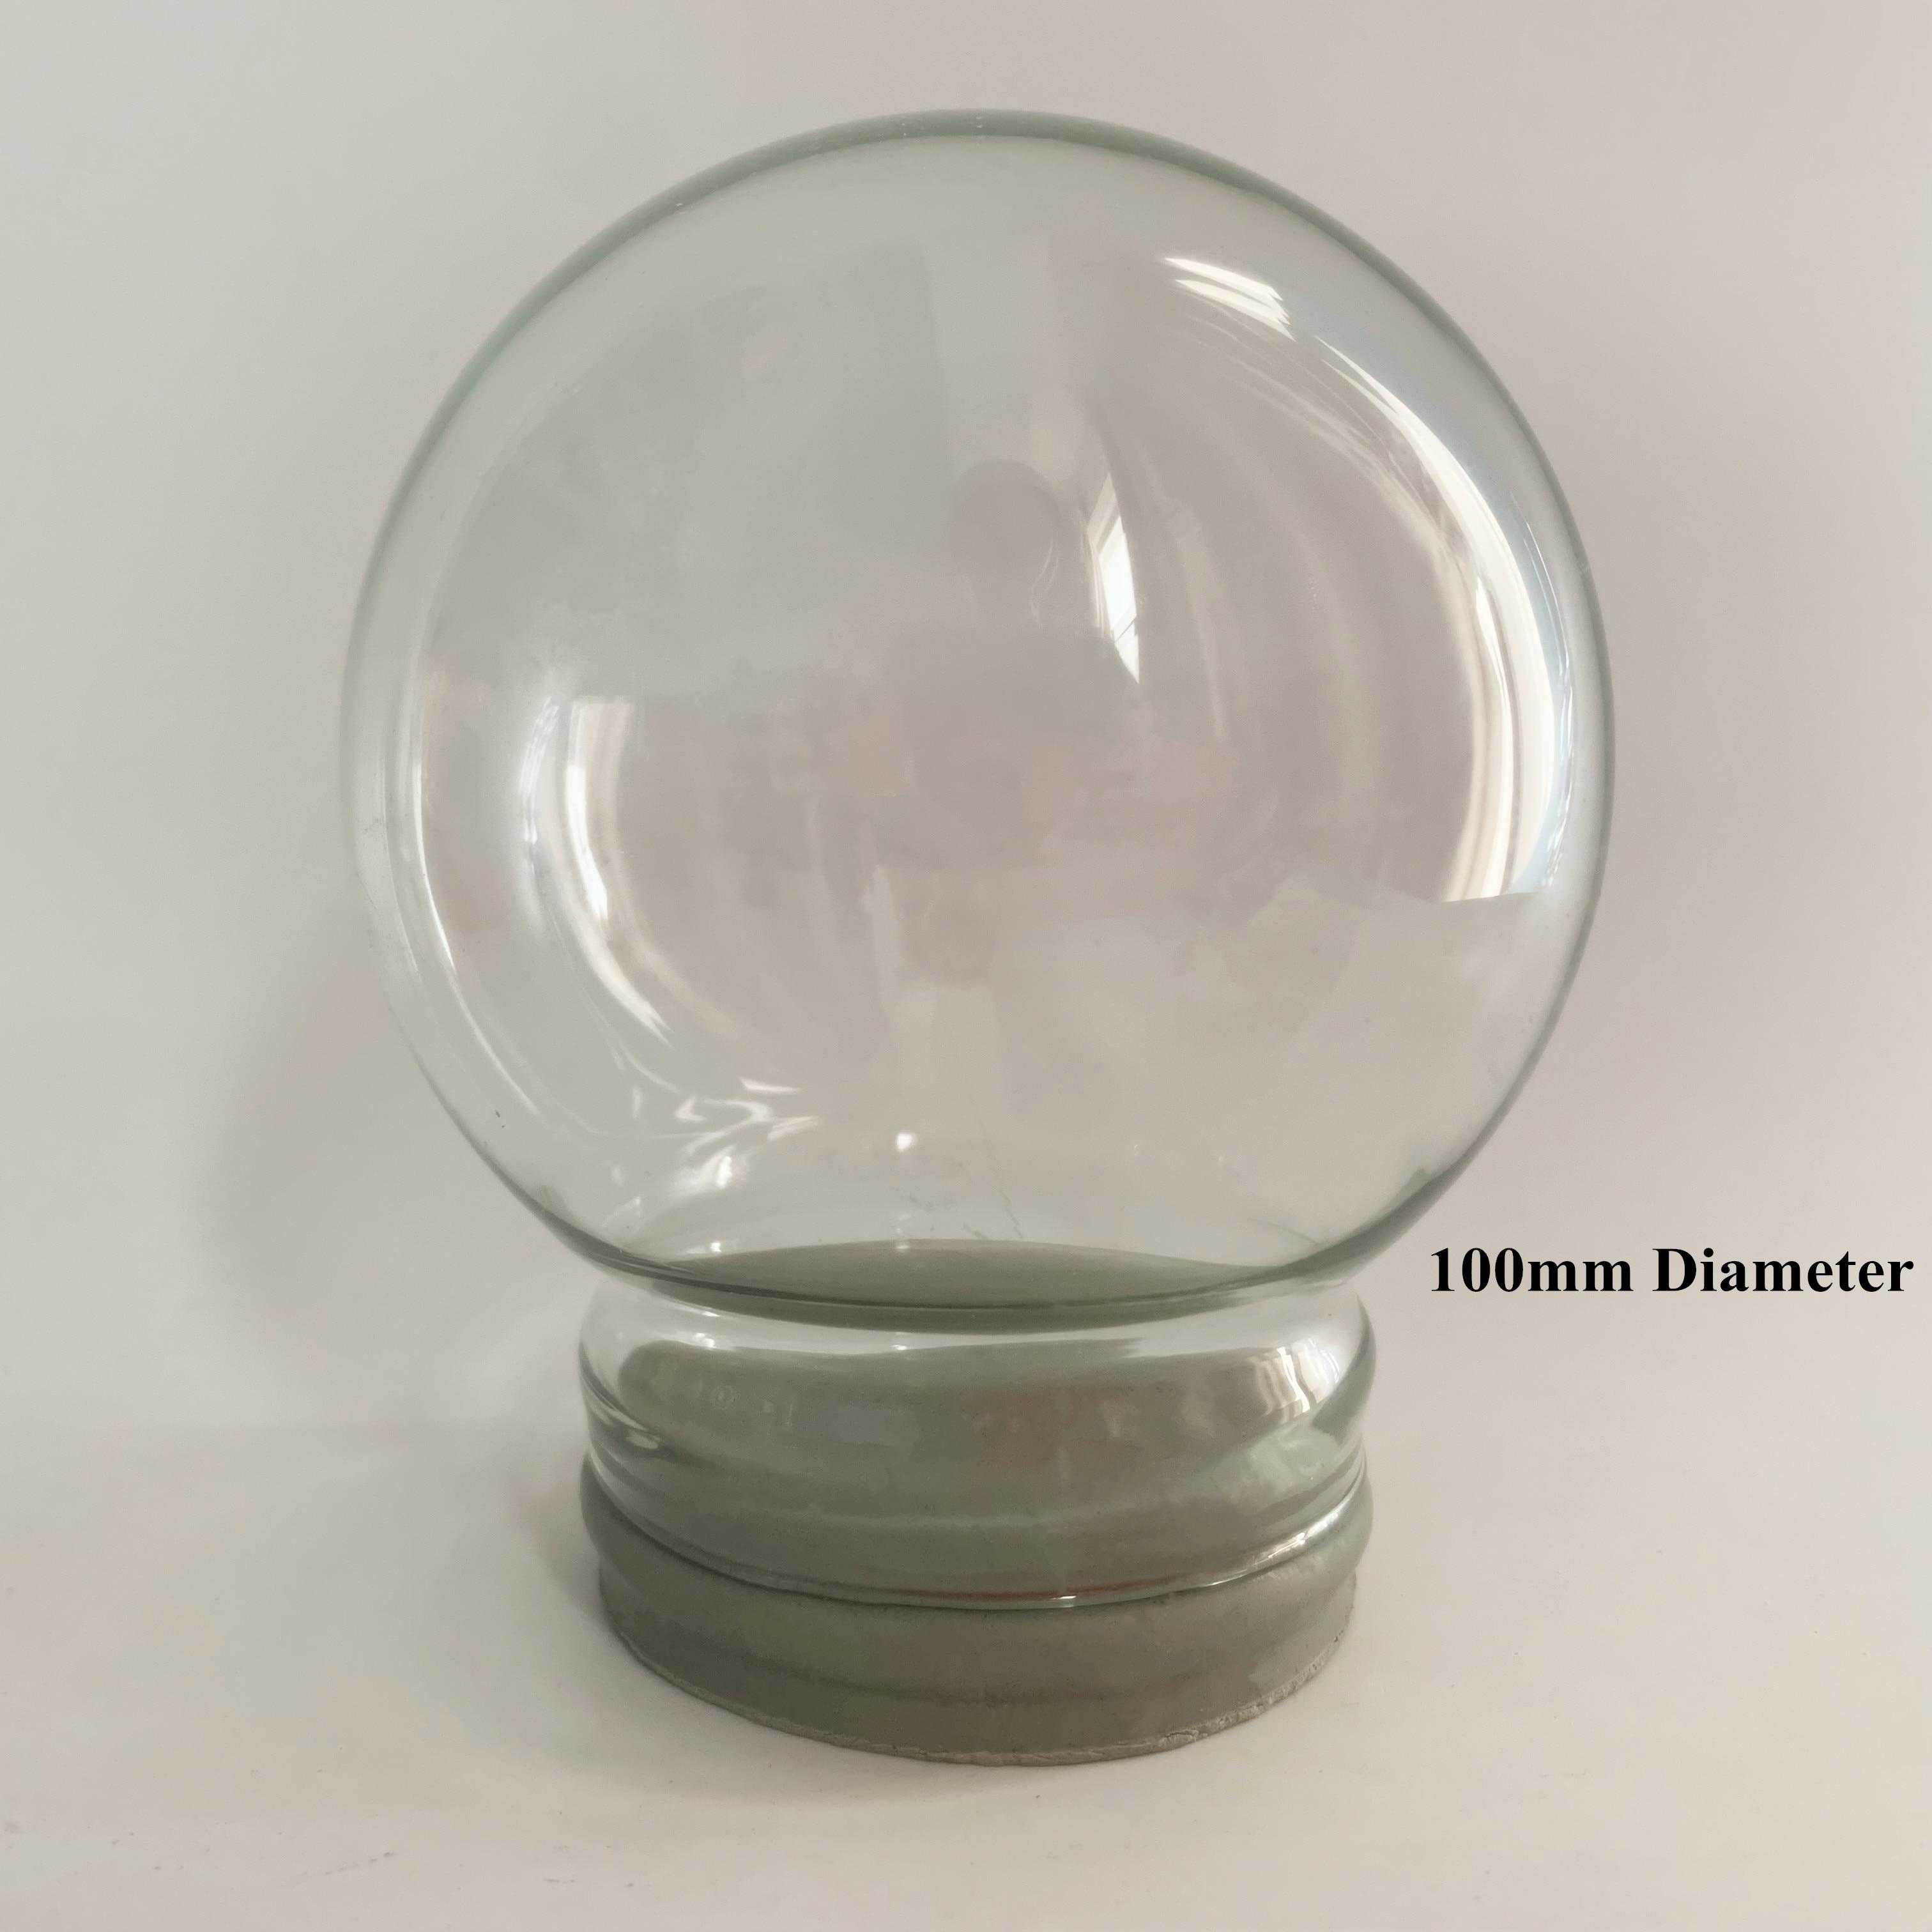 Promotional Gift 100 Mm Diameter DIY Empty Glass Snow Globe Kit Wholesales